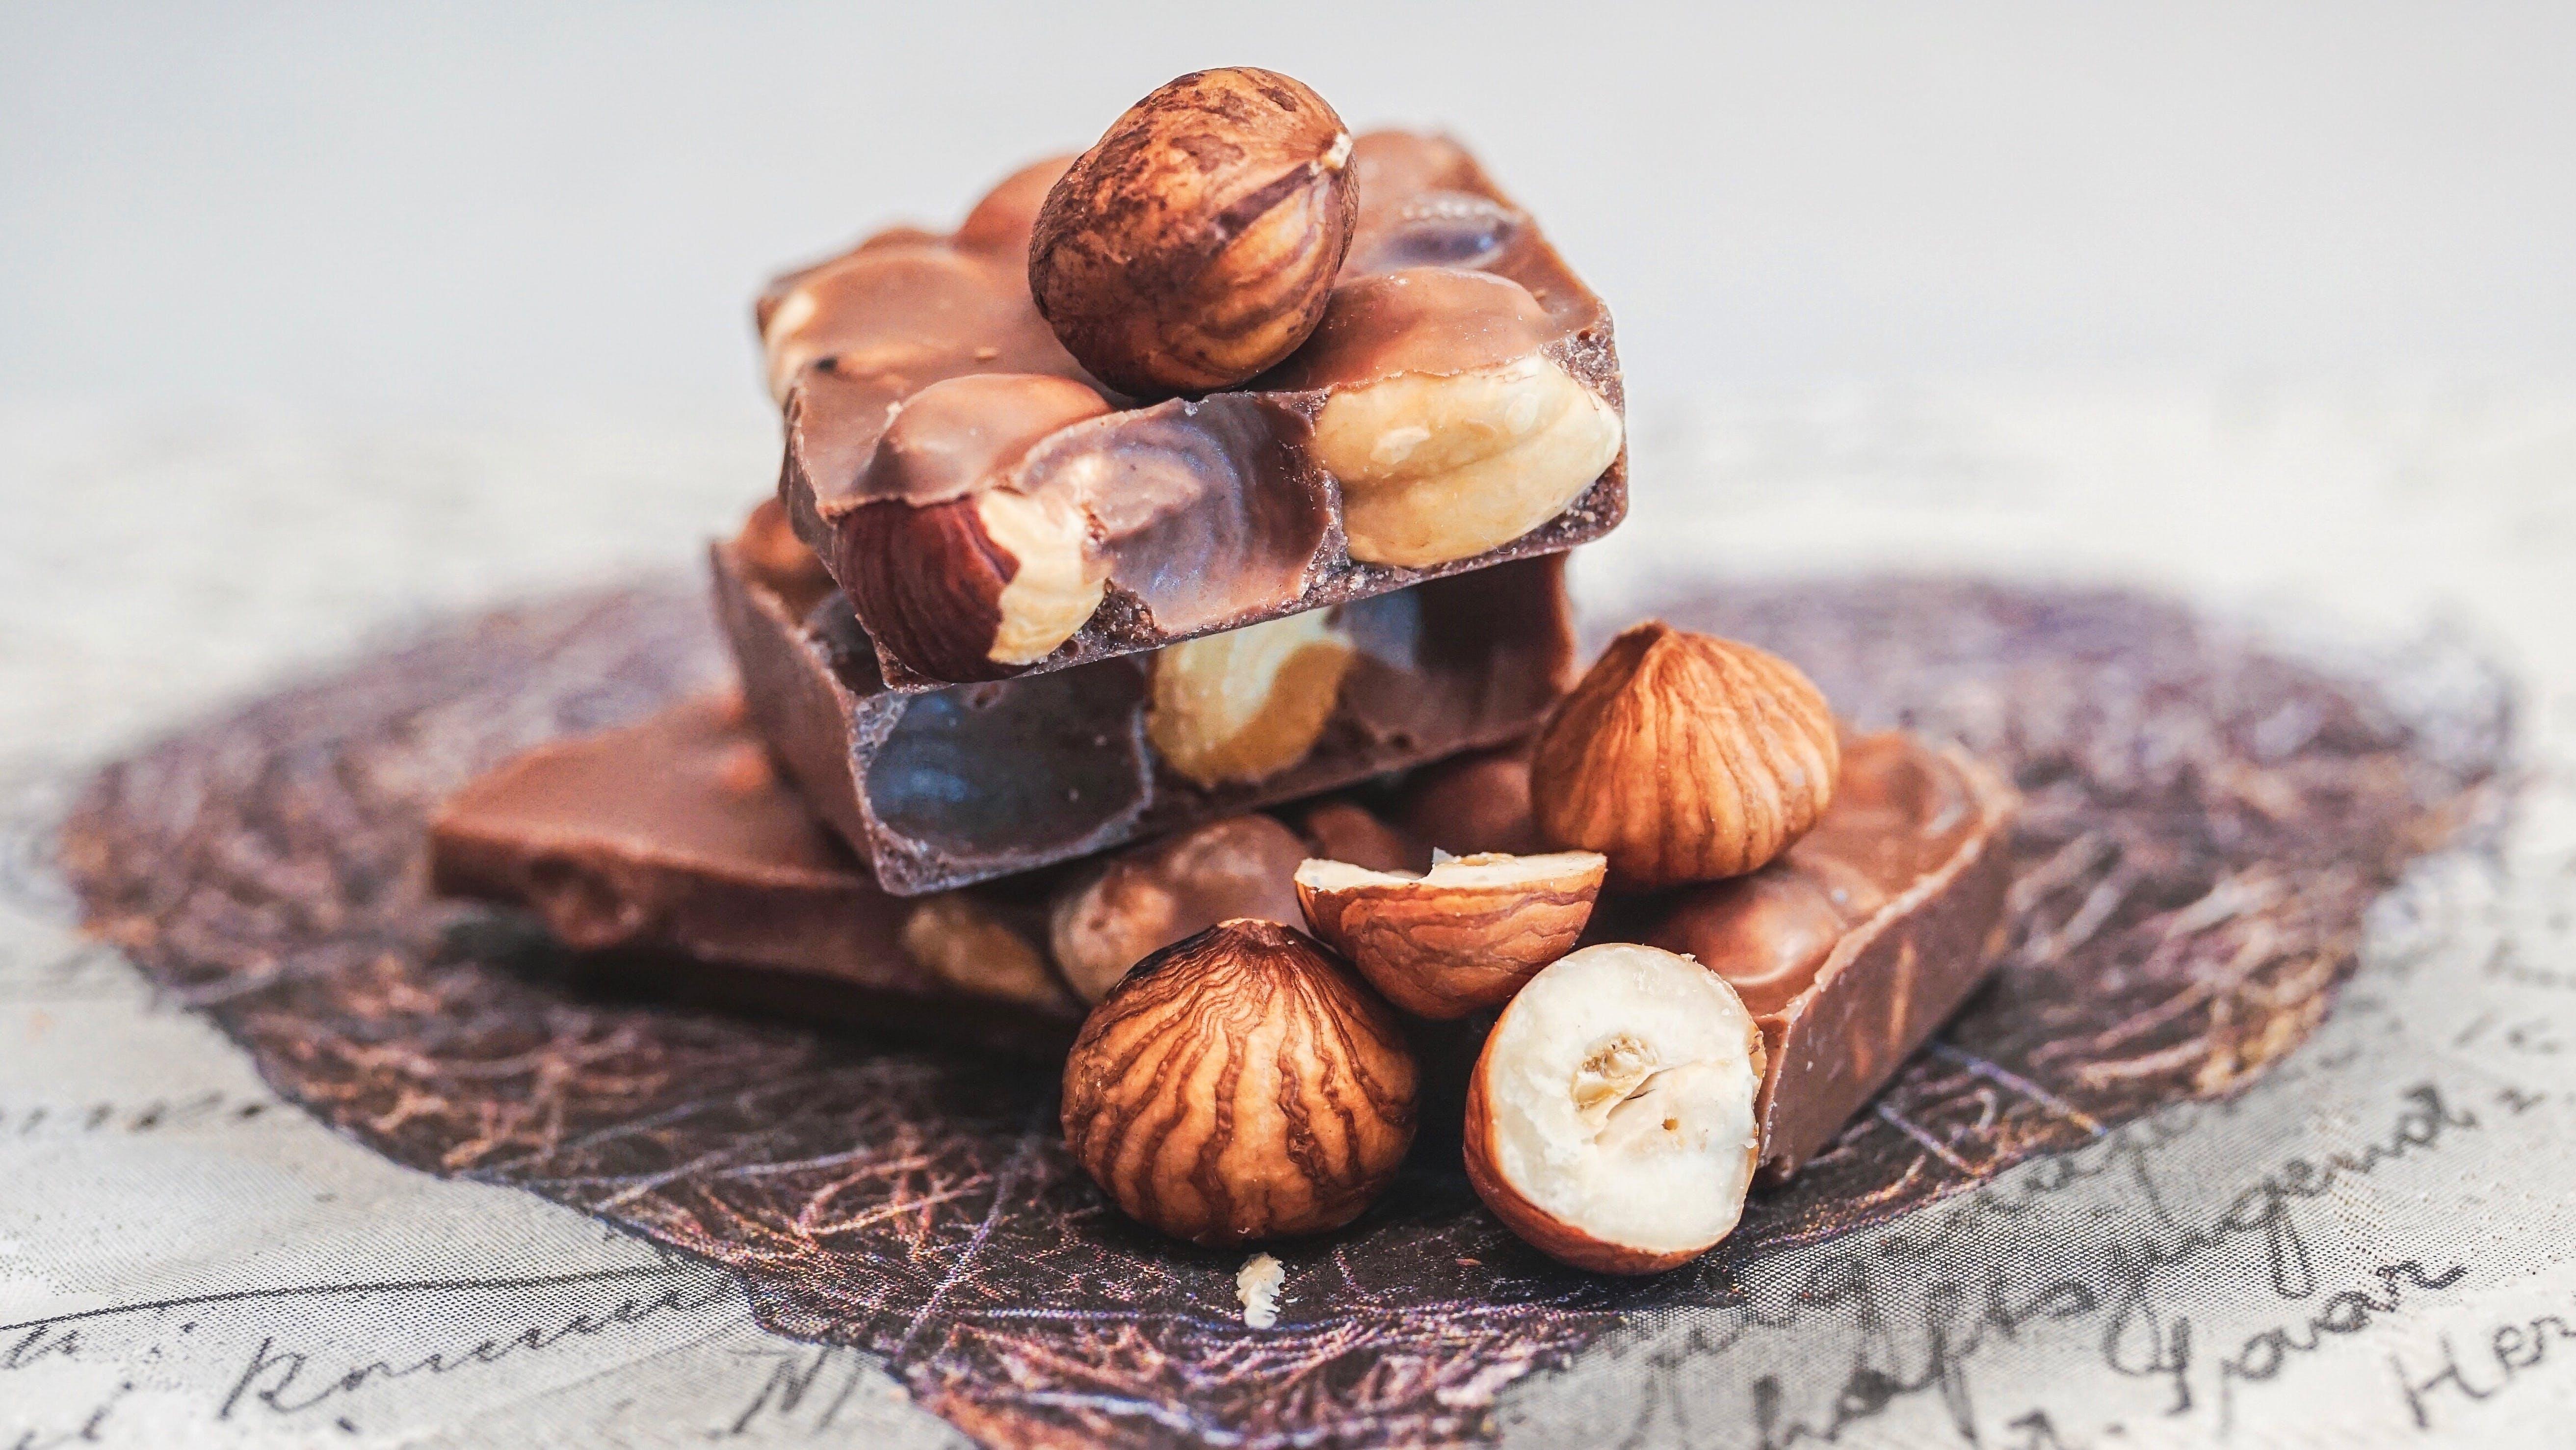 Pile of Chocolate Bar